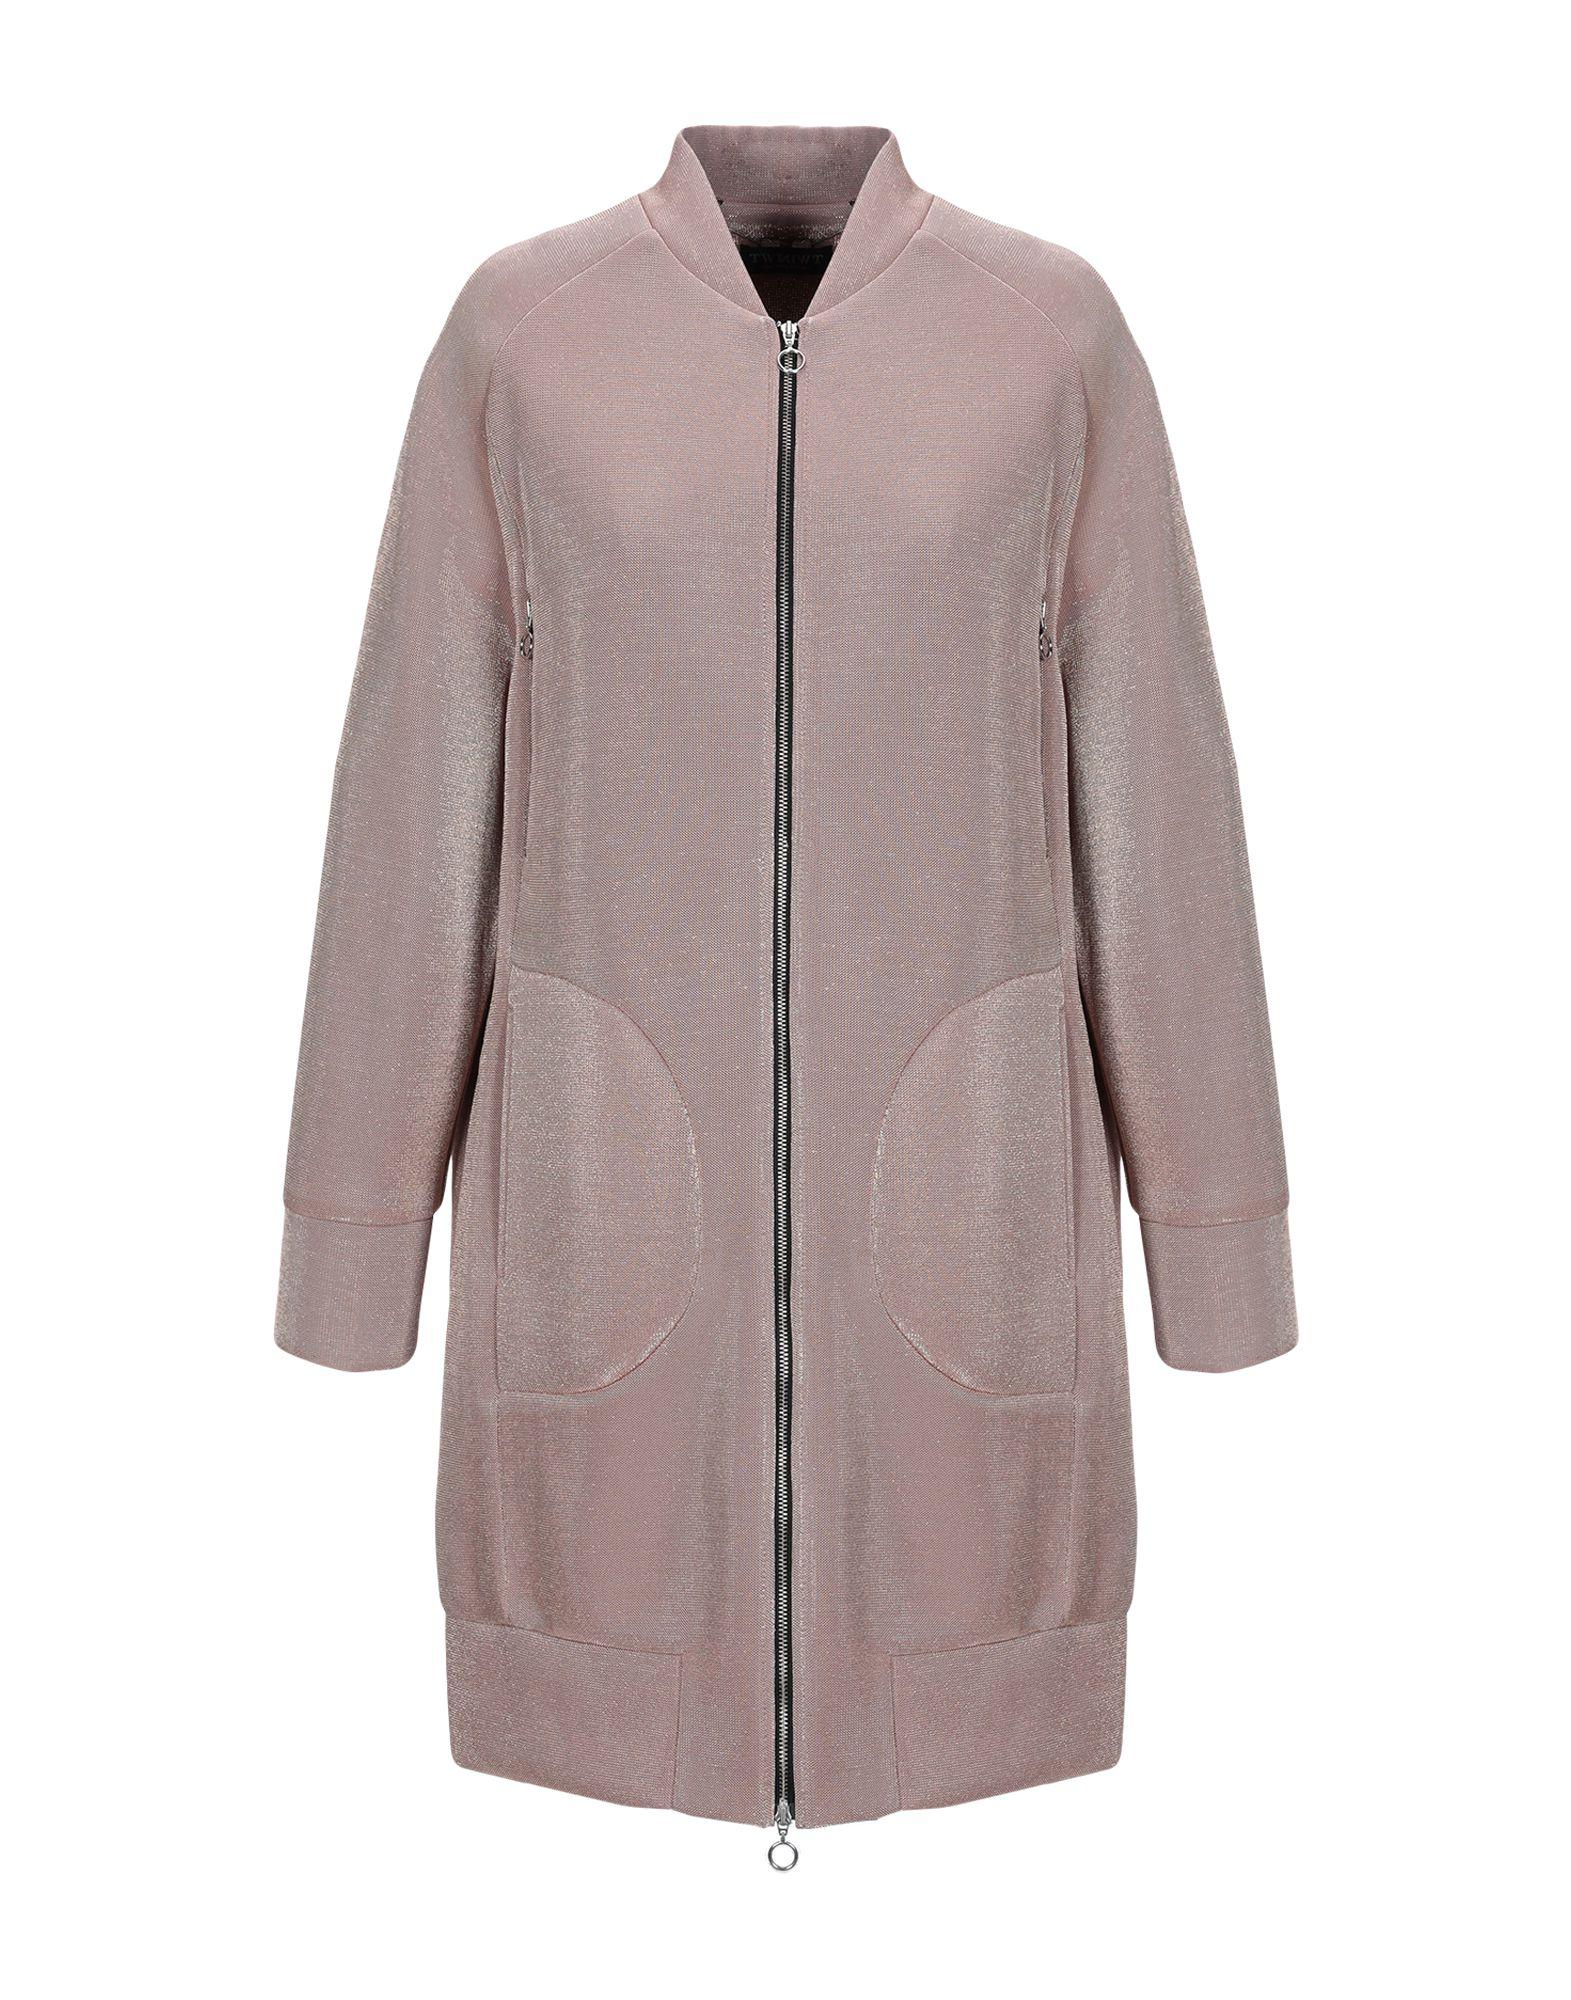 TWINSET Overcoats - Item 41853115